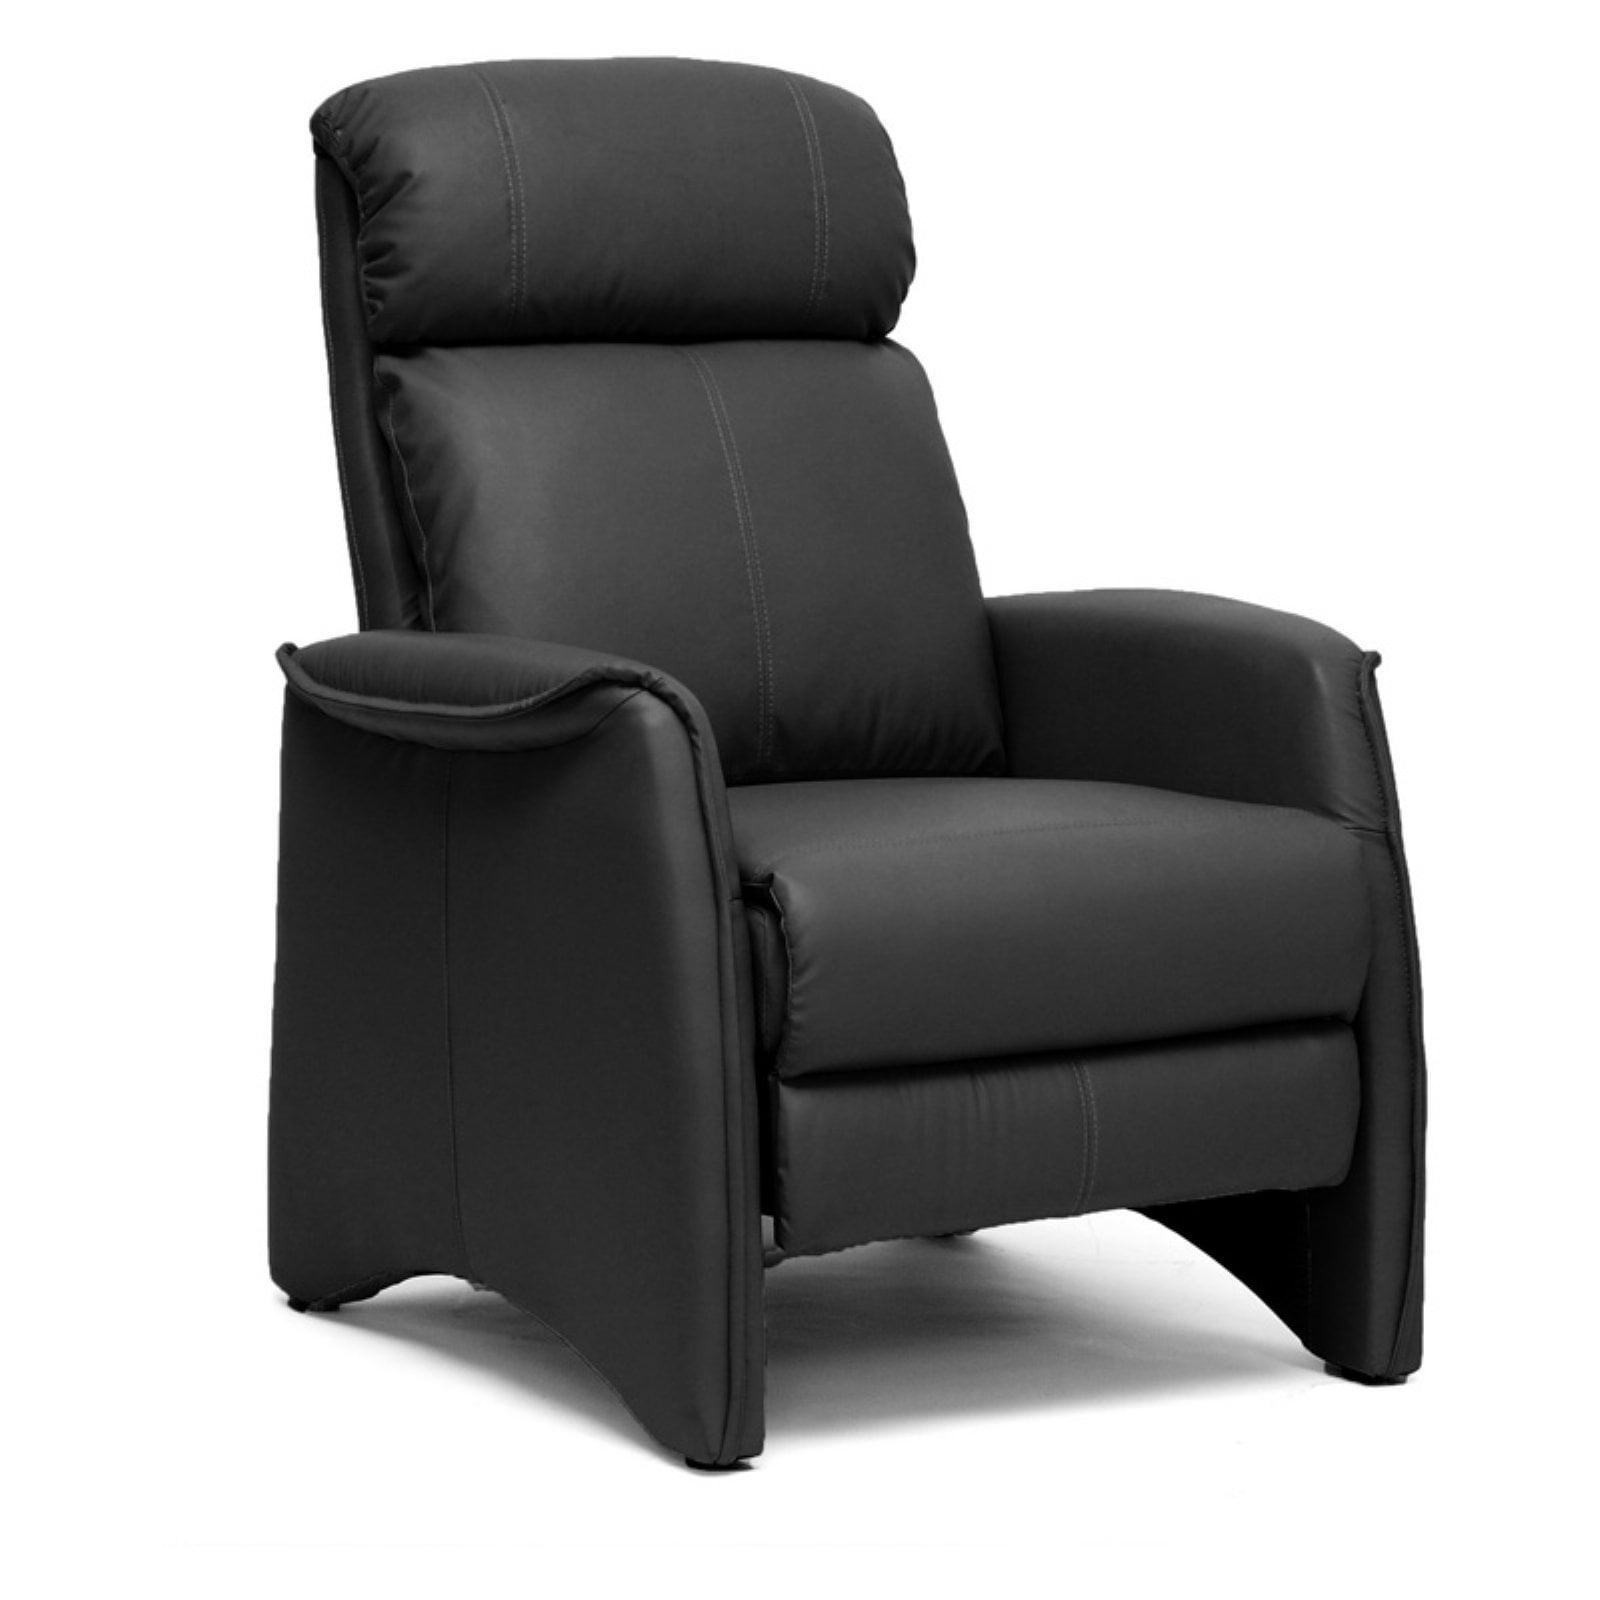 Aberfeld Black Modern Recliner Club Chair by Baxton Studio